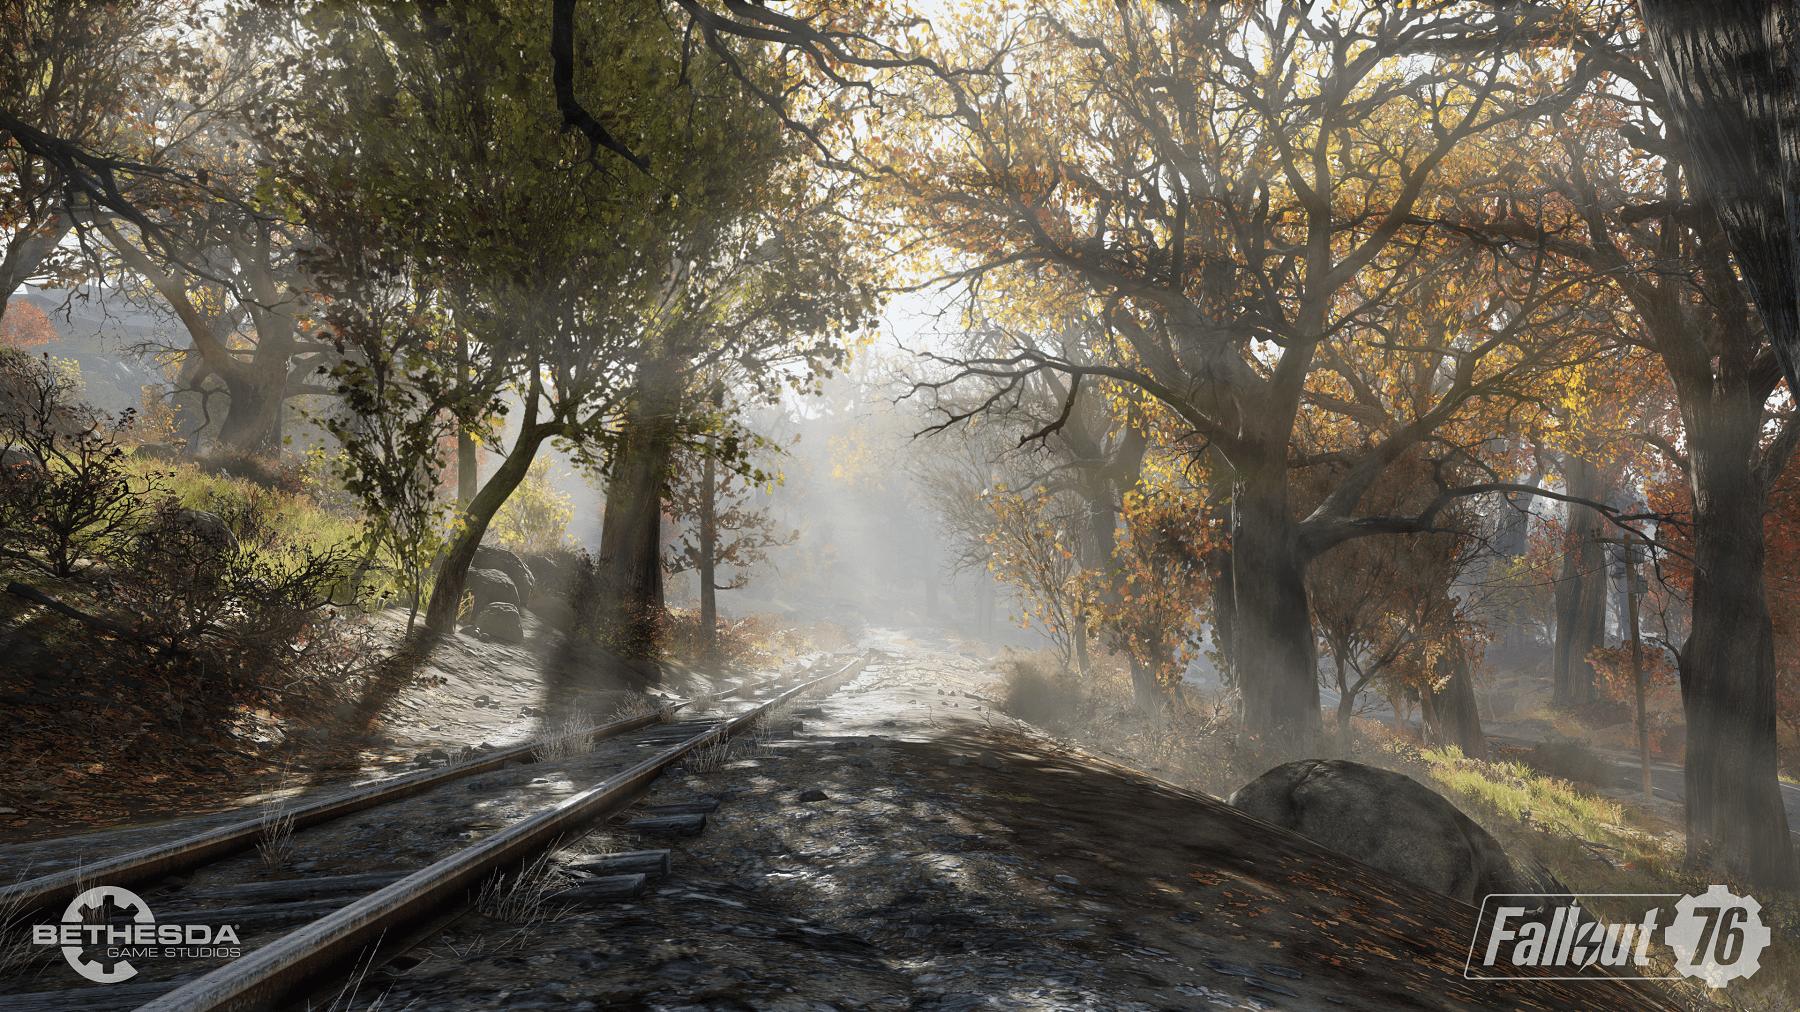 Fallout76 8